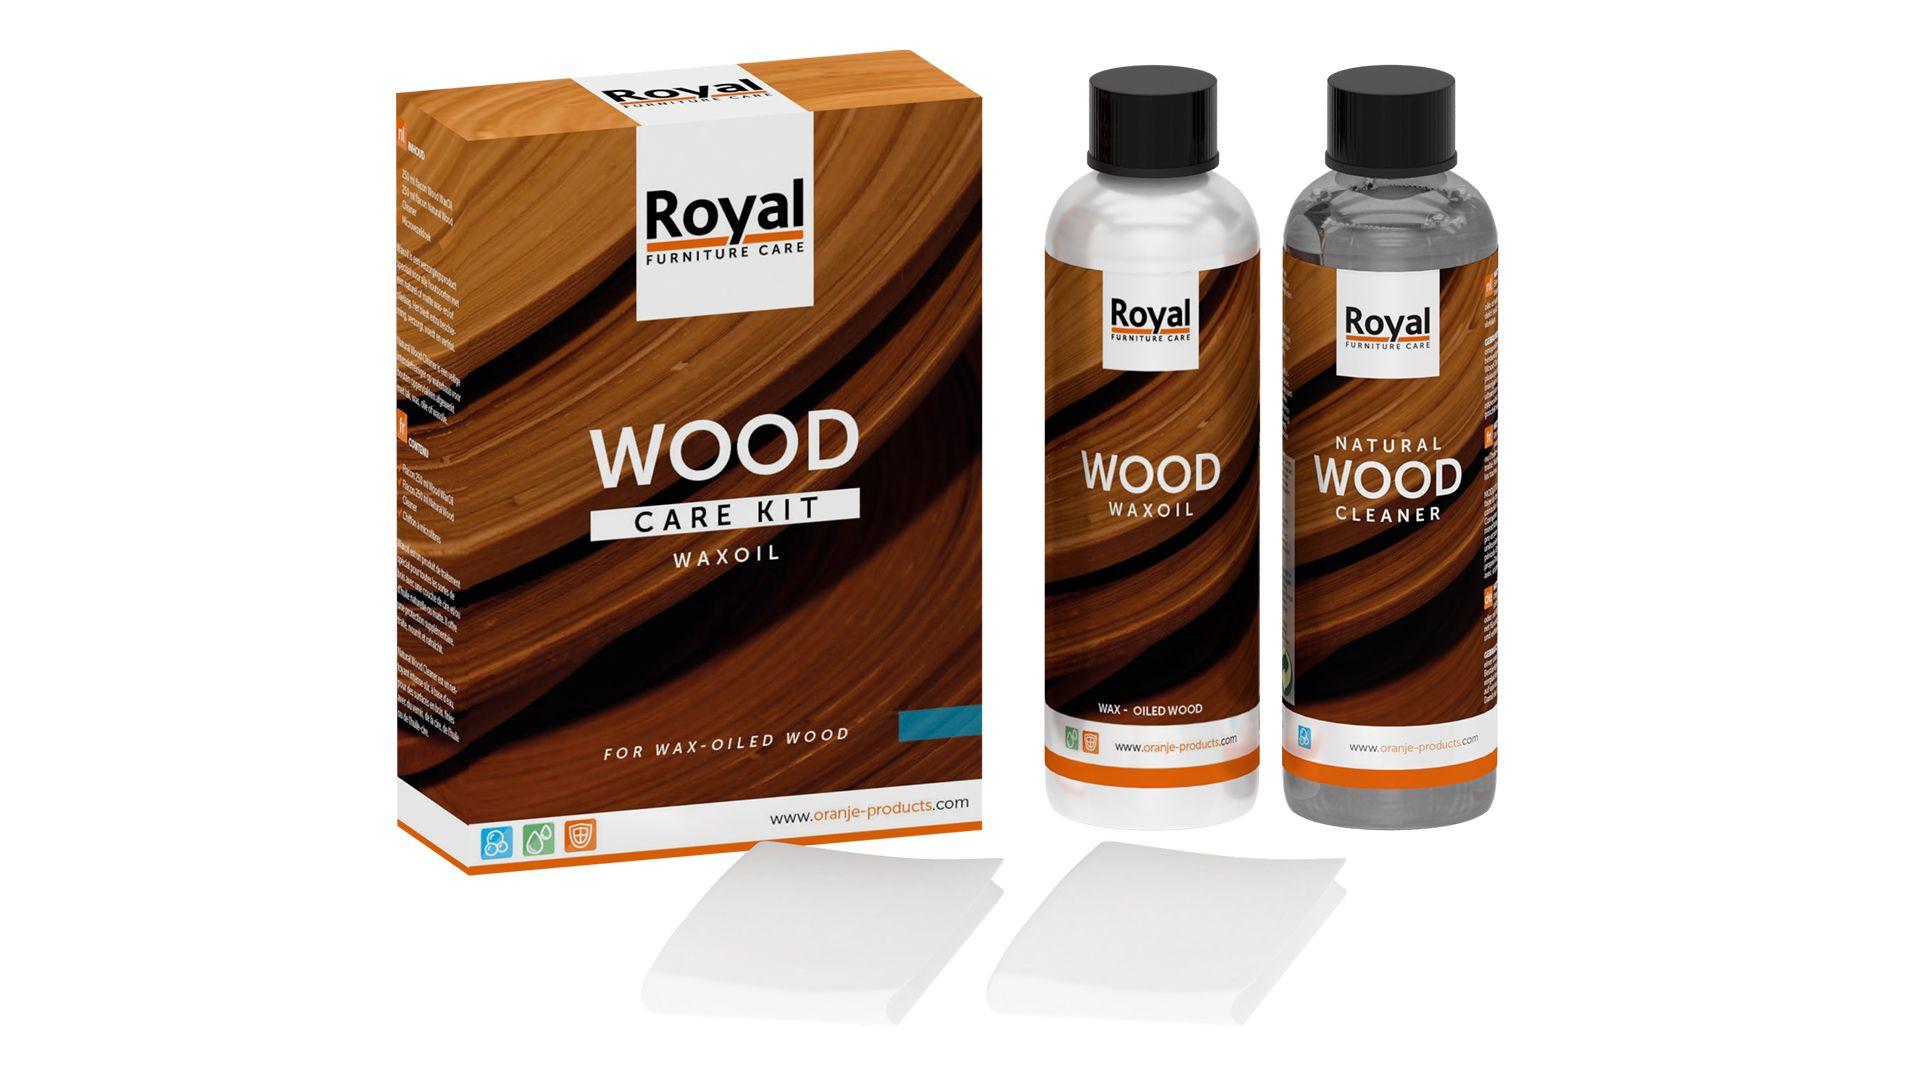 Wood Care Kit Waxoil